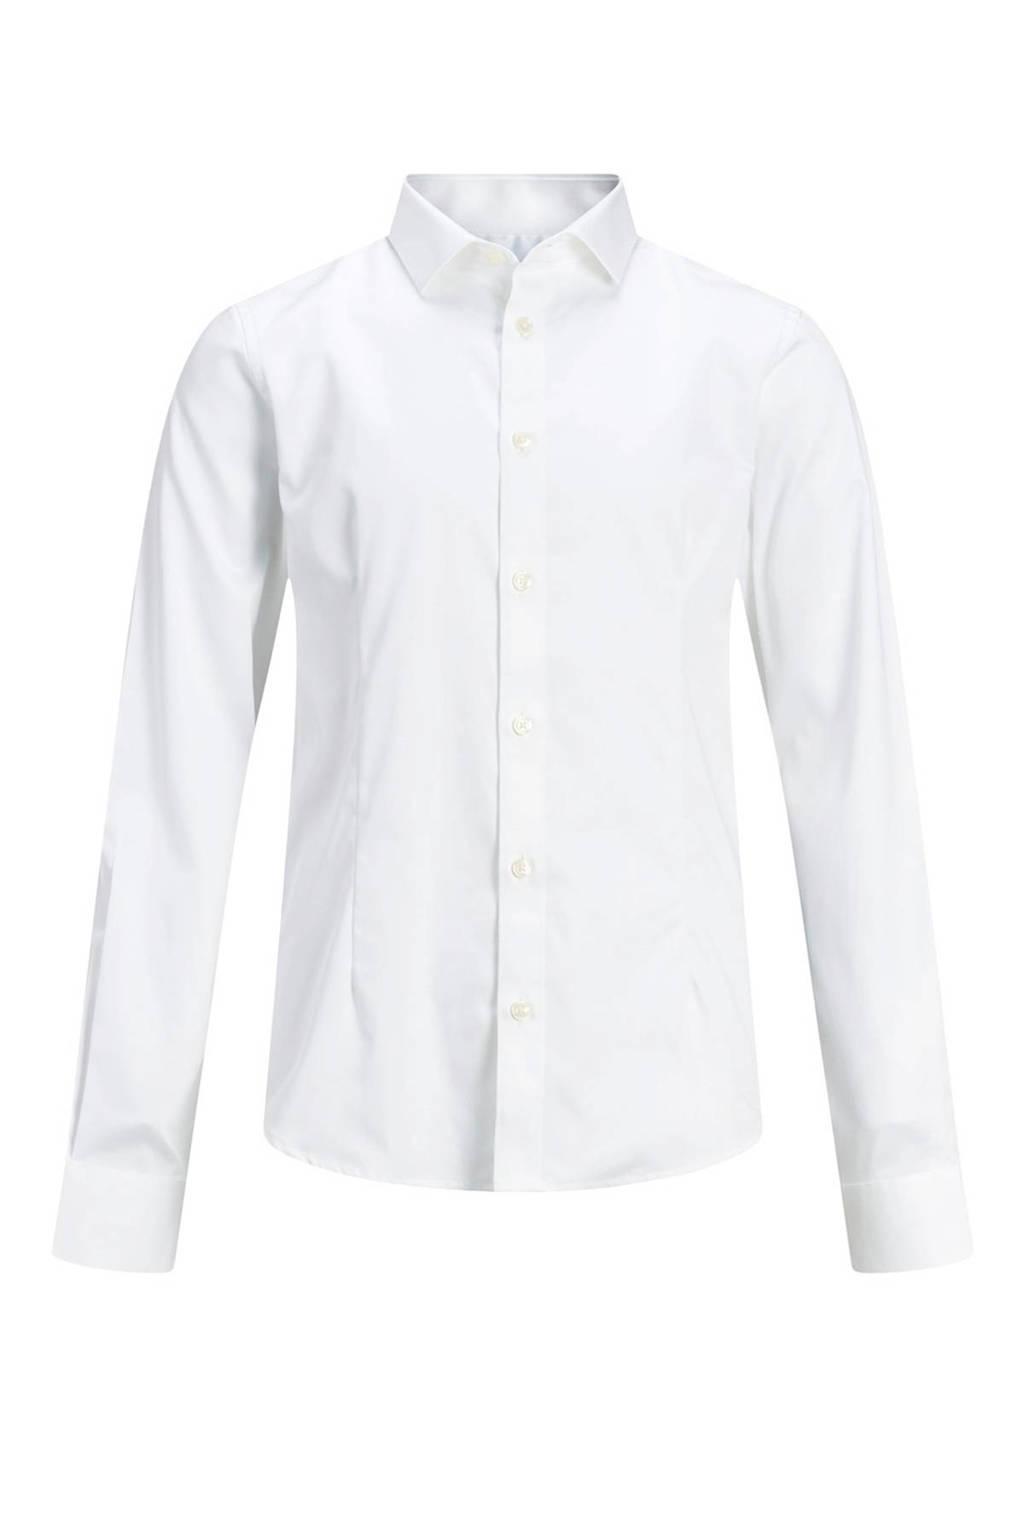 JACK & JONES JUNIOR overhemd Parma wit, Wit